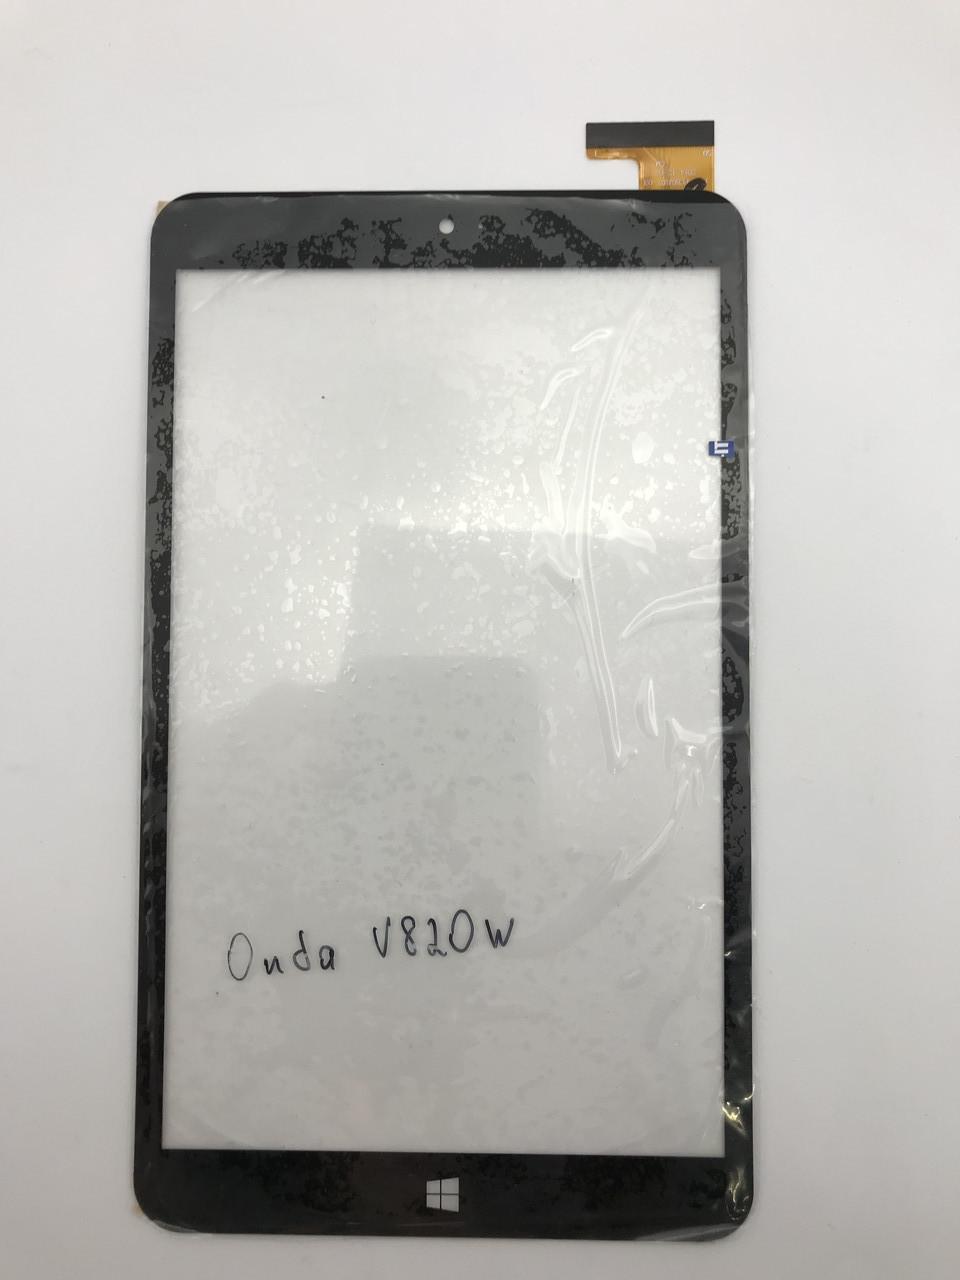 Тачскрин Onda V820w / chuwi Vi8 FPC-FC80J107-03 Сенсор тачскрин